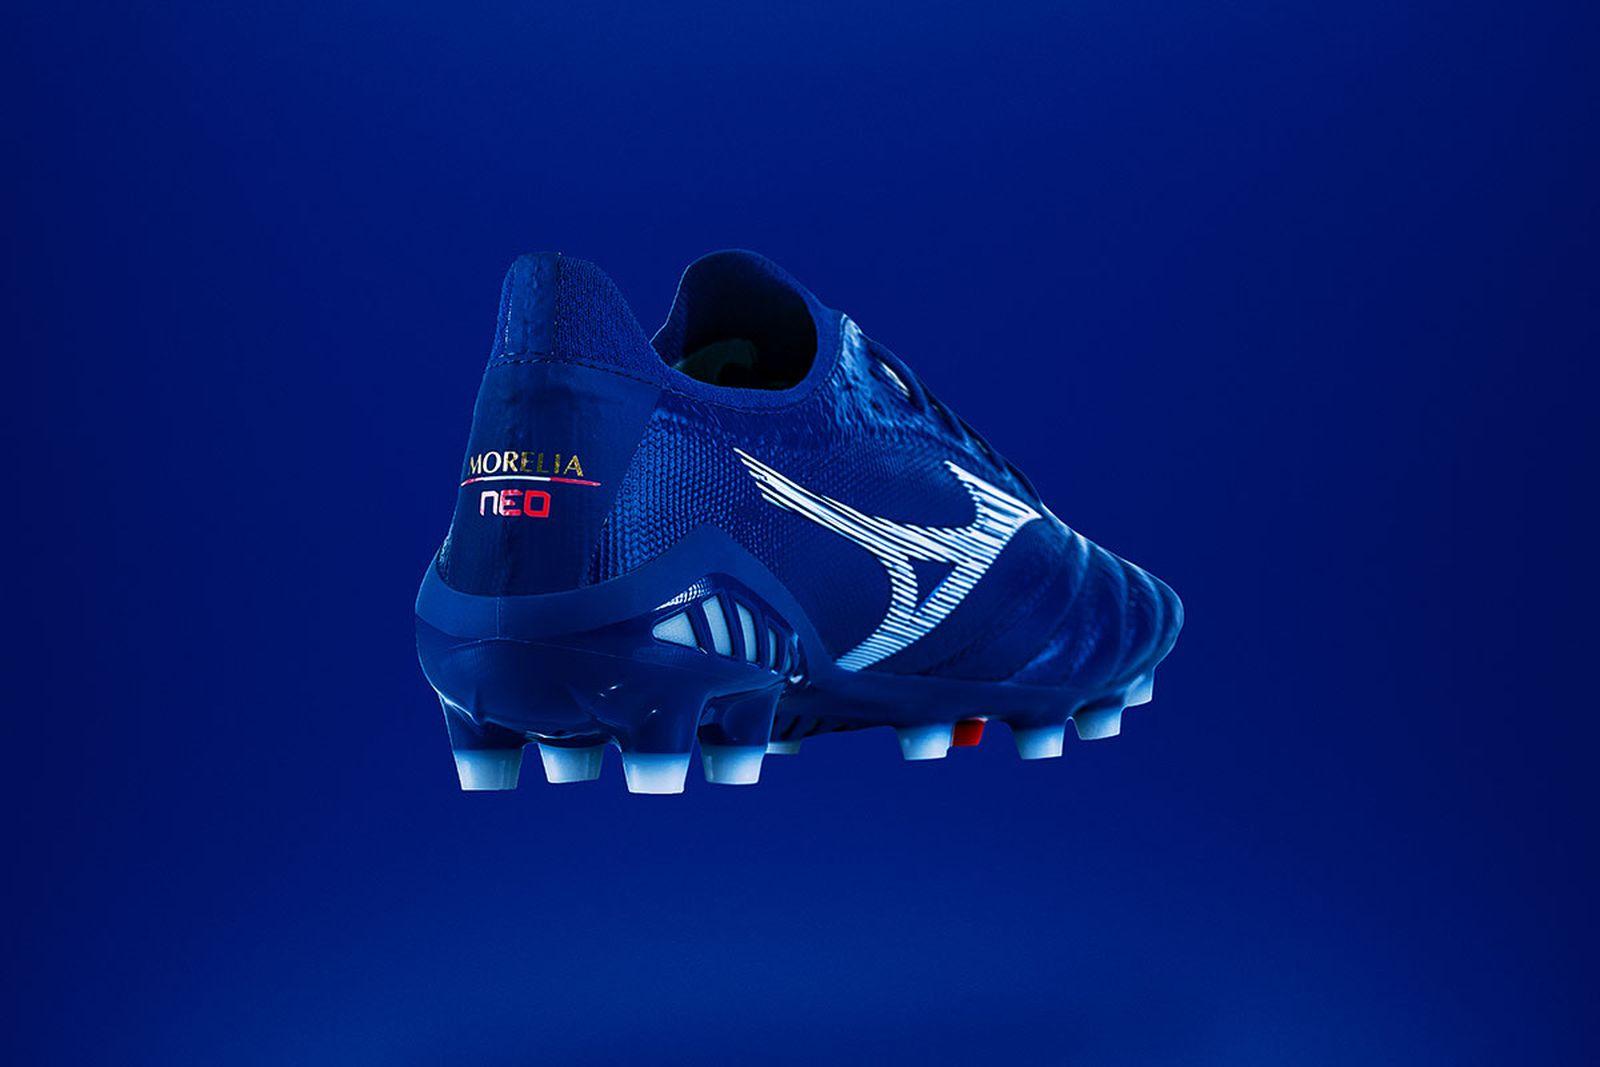 Mizuno Morelia Neo 3 blue kangaroo leather football boot product shot heel view